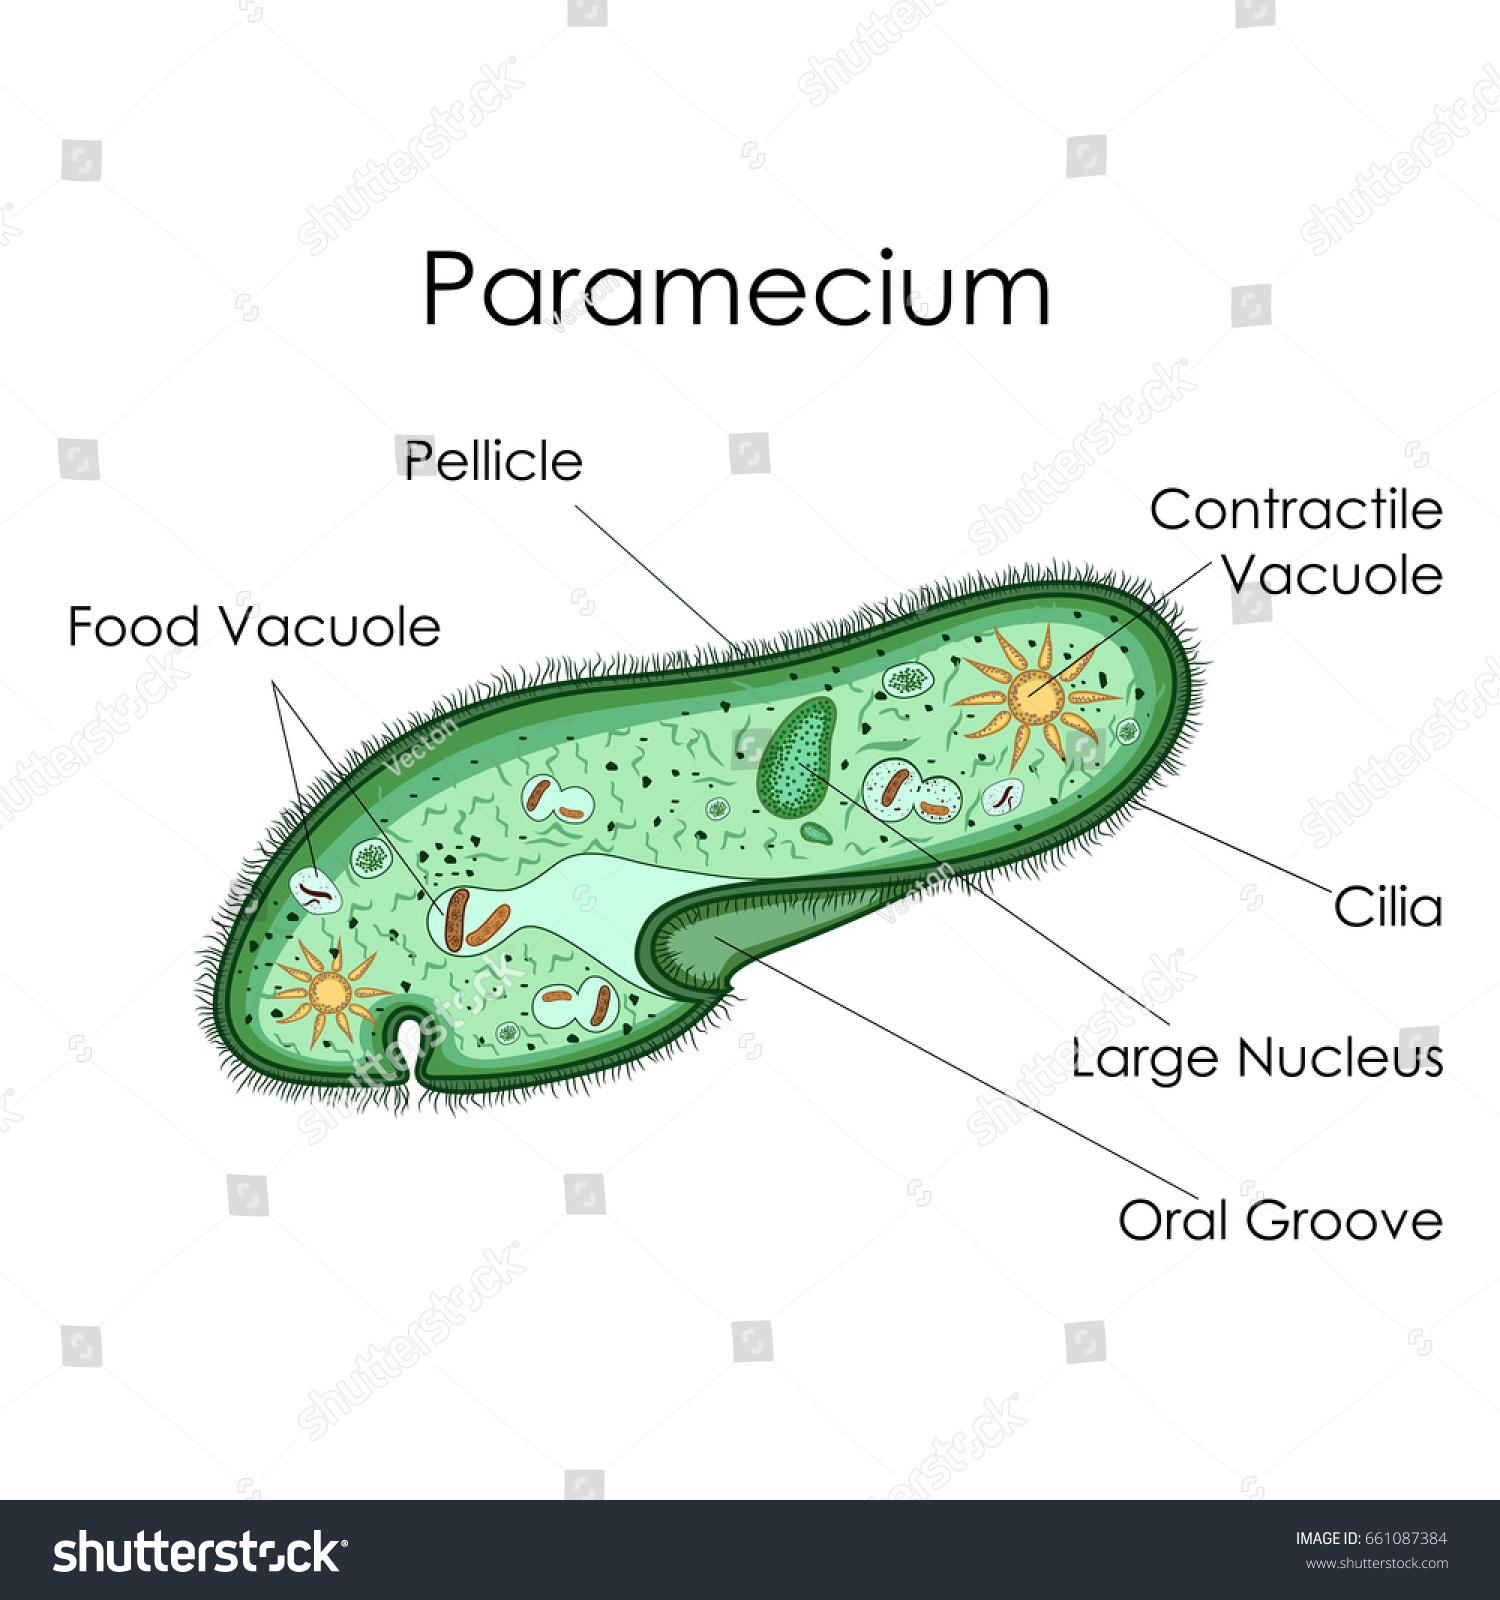 Education chart biology paramecium diagram vector stock vector education chart of biology for paramecium diagram vector illustration pooptronica Gallery